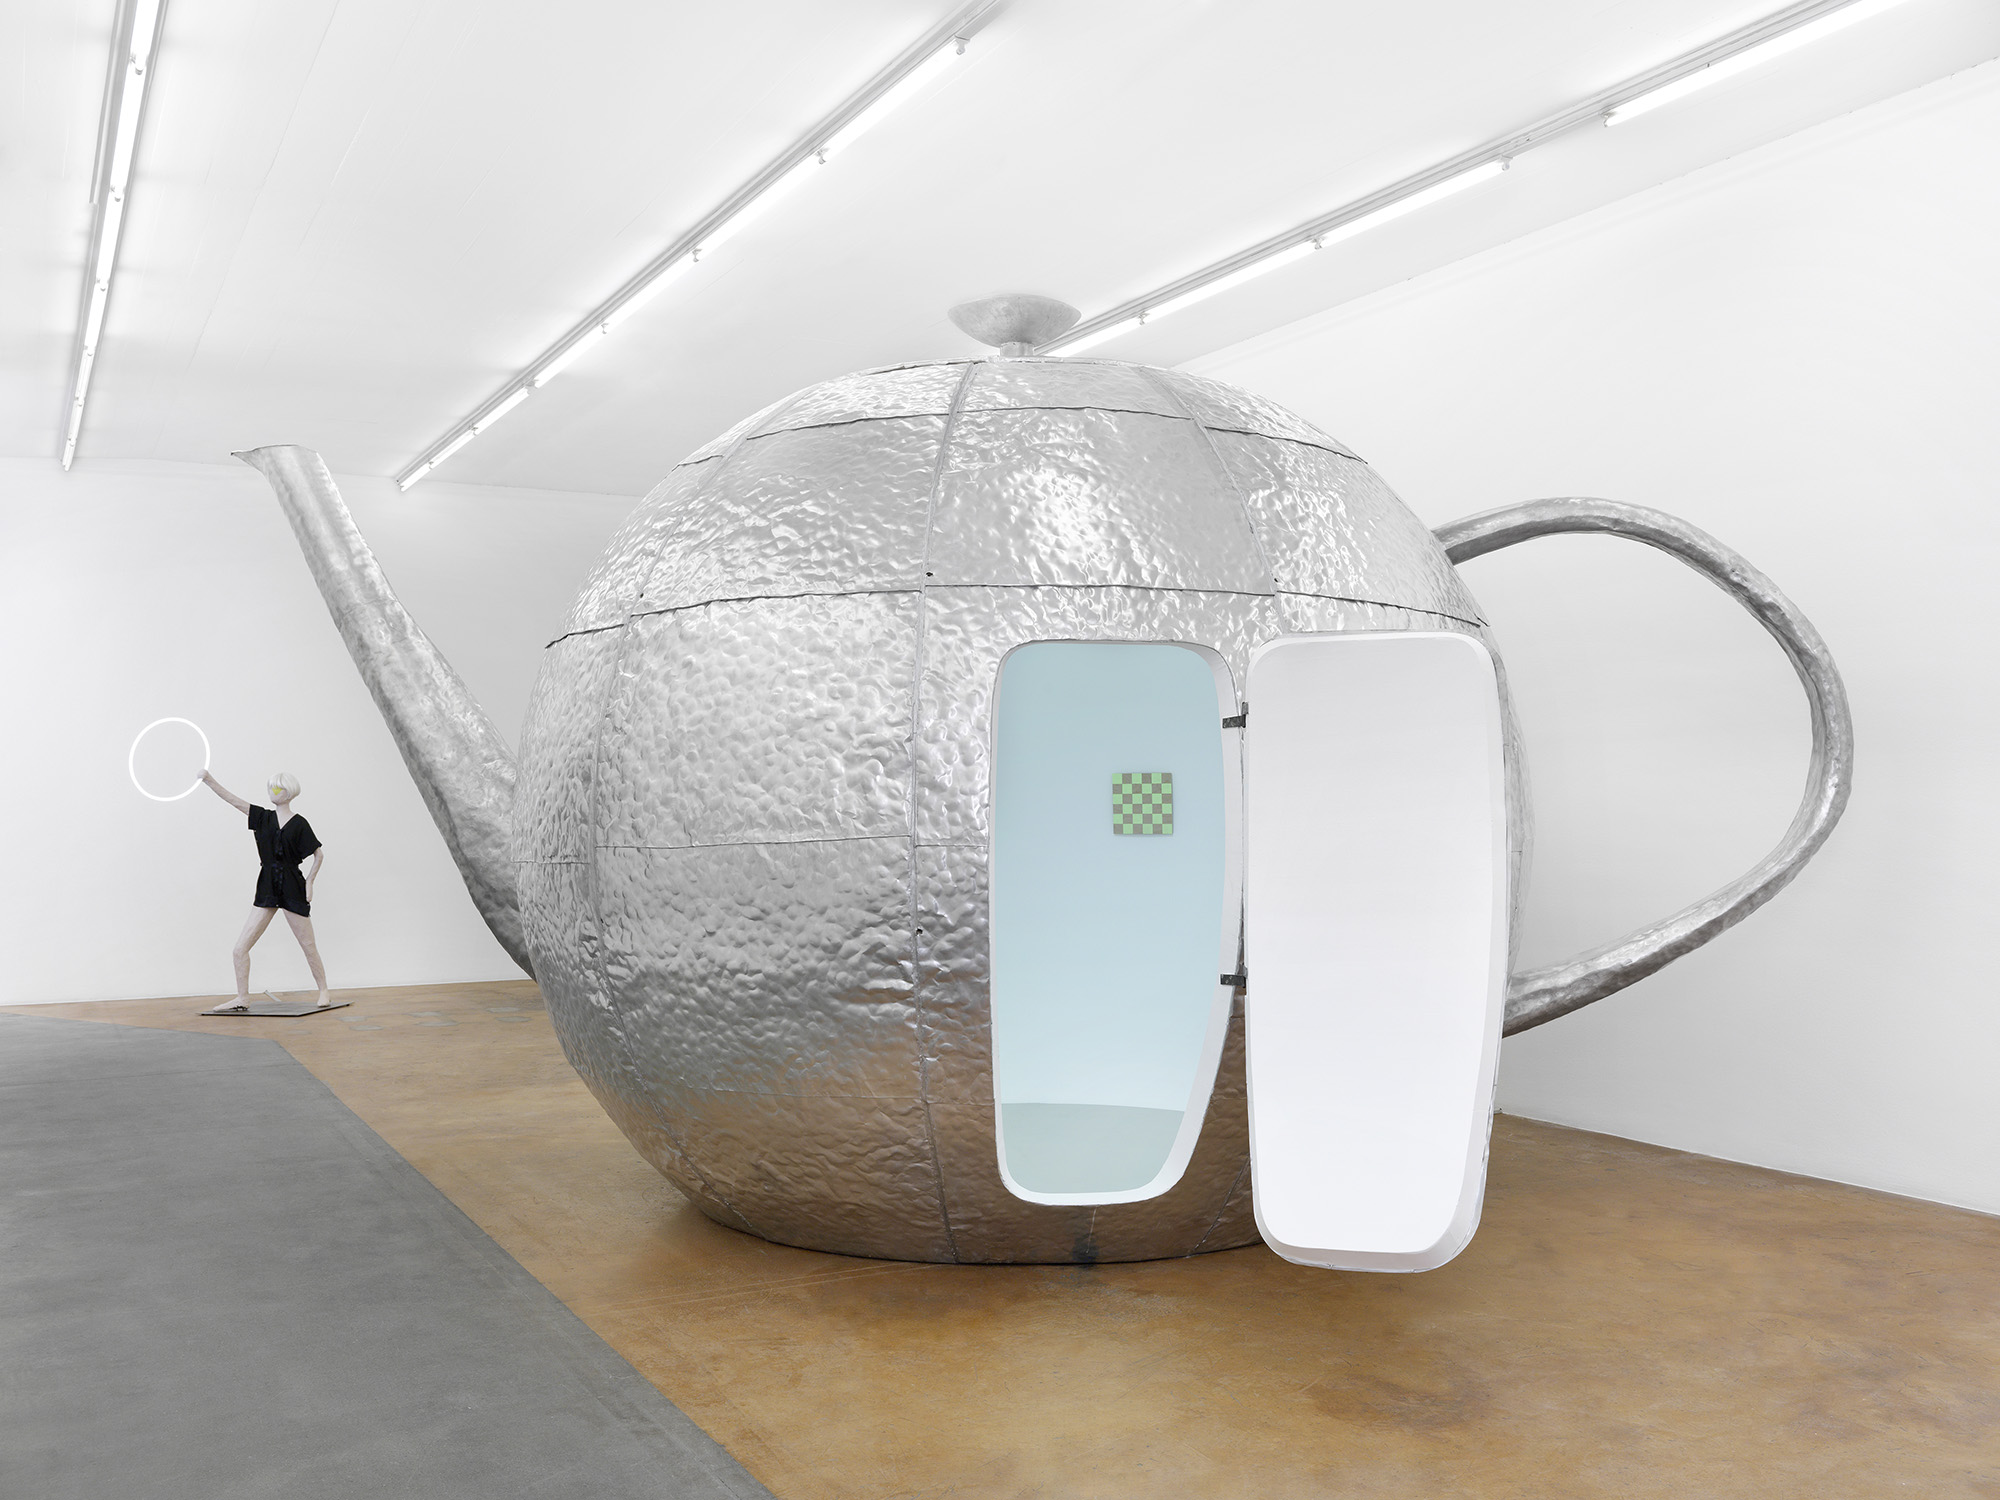 Expositions d 39 automne 2018 20109 du mamco exposition gen ve for Artistes minimalistes